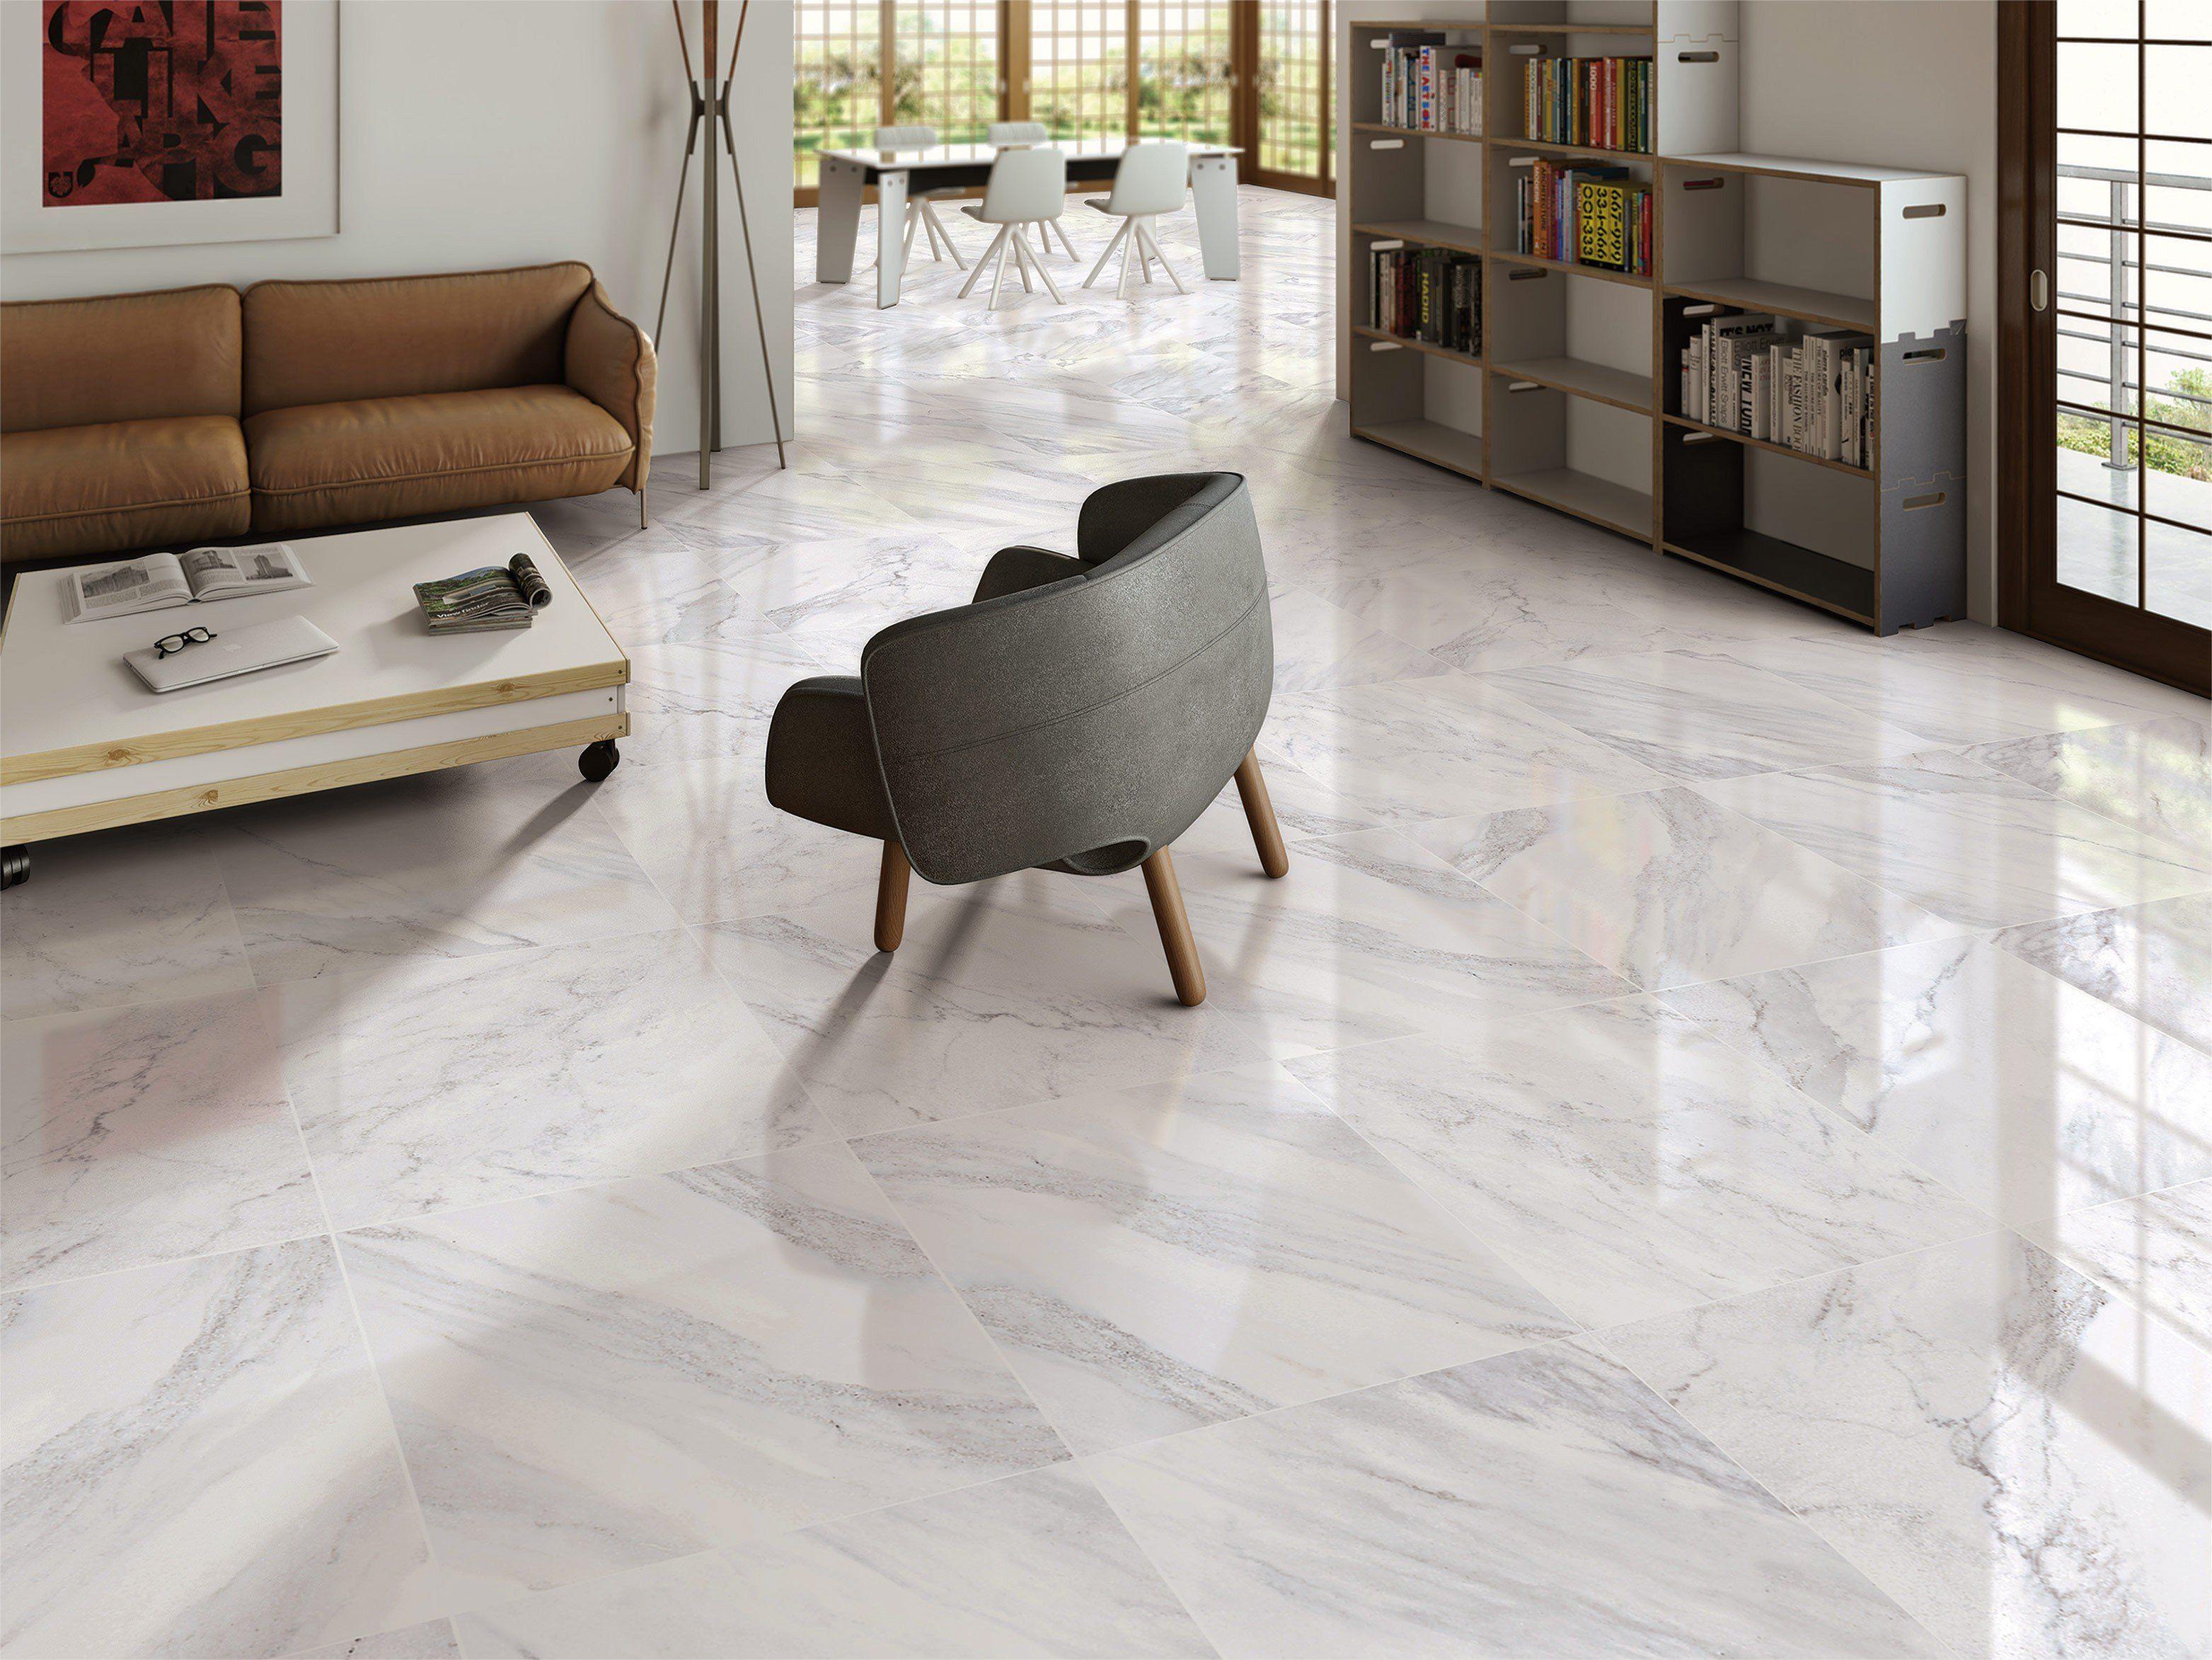 Reflective gloss white 600x600mm carrara marble effect